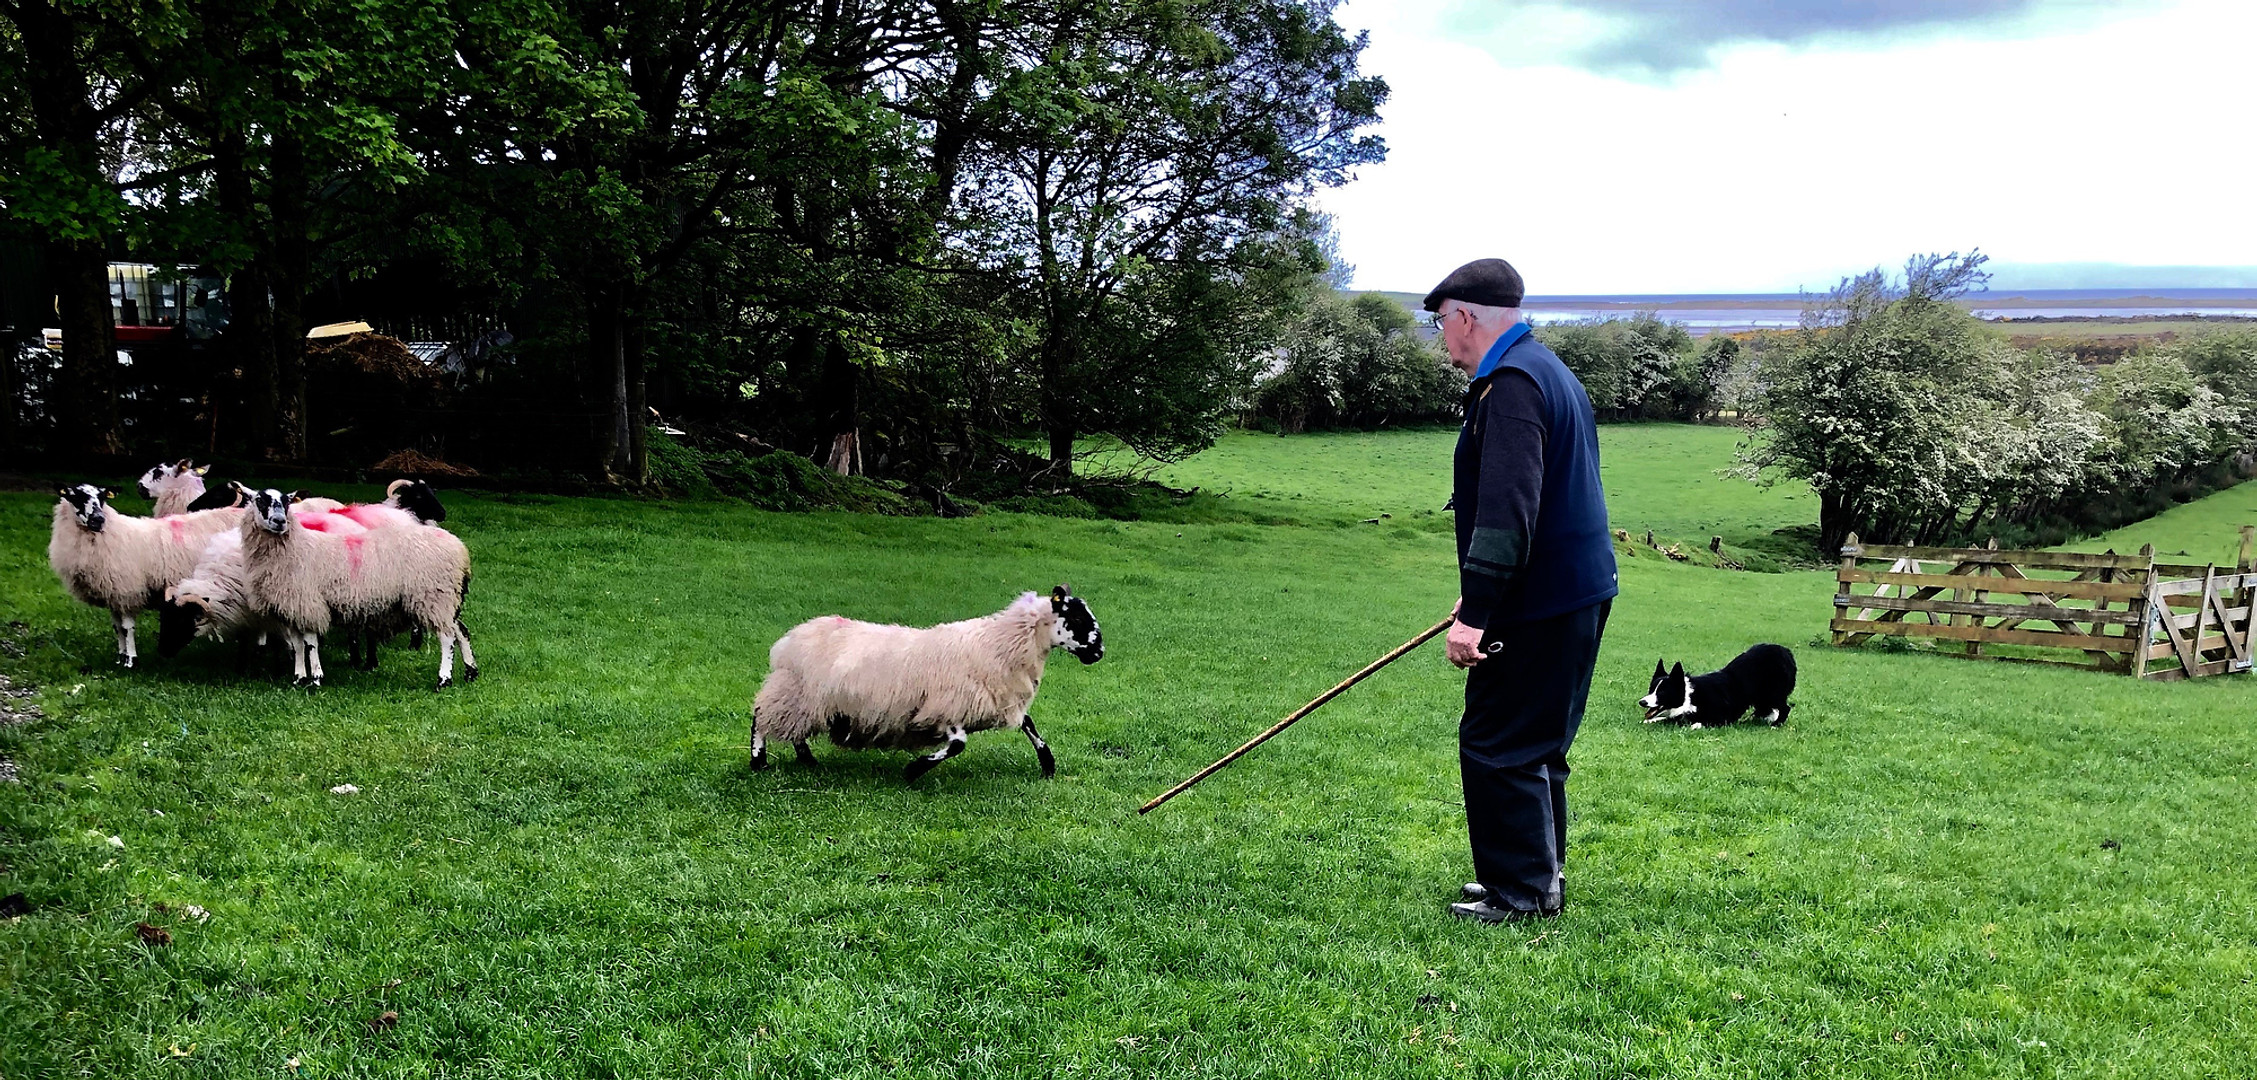 Ireland005.jpg